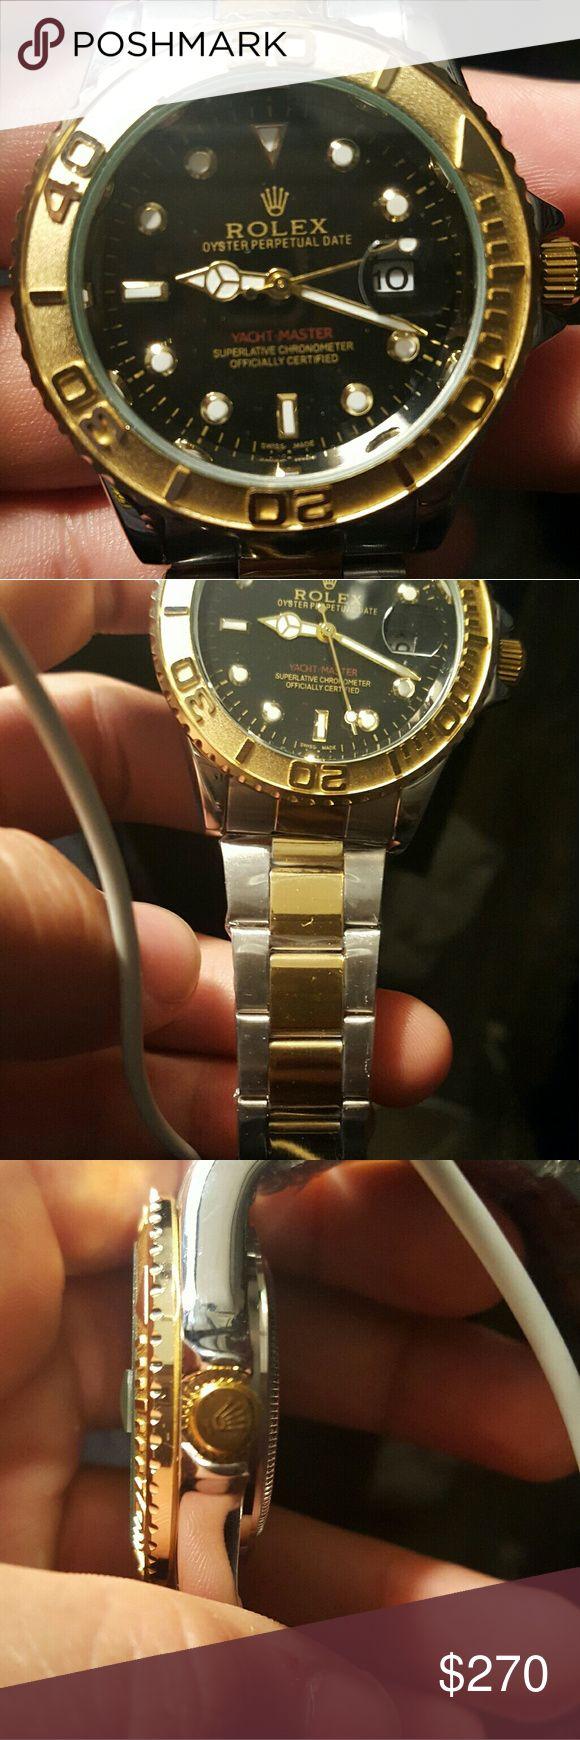 Rolex 1992 Yachtmaster homage Works, no scratches, brand new Rolex Accessories Watches